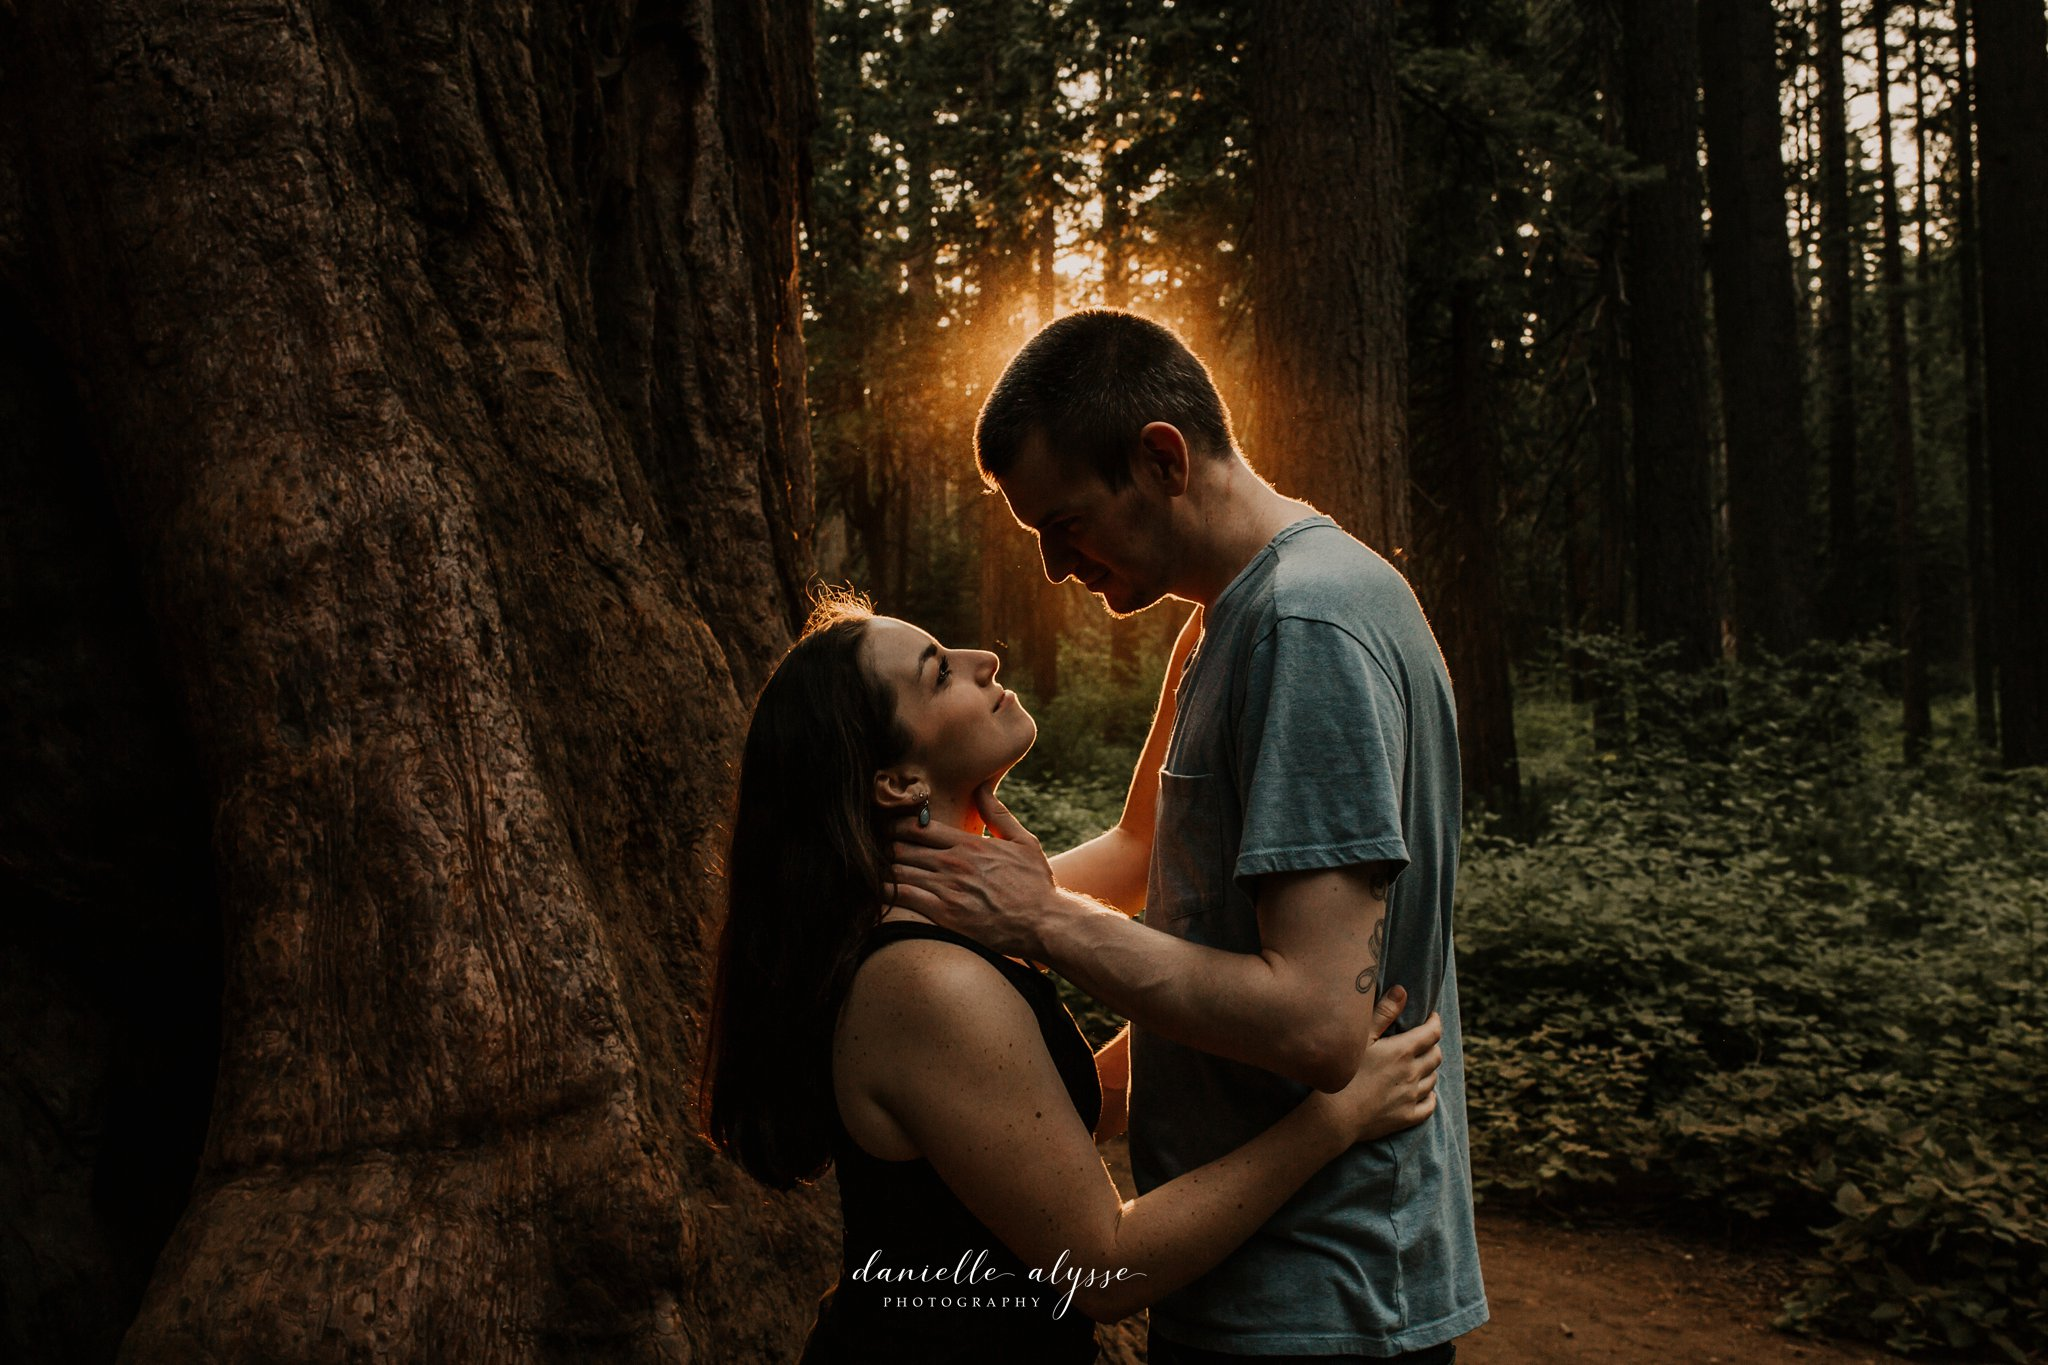 180811_engagement_kathryn_calvaras_big_trees_park_arnold_danielle_alysse_photography_blog_72_WEB.jpg